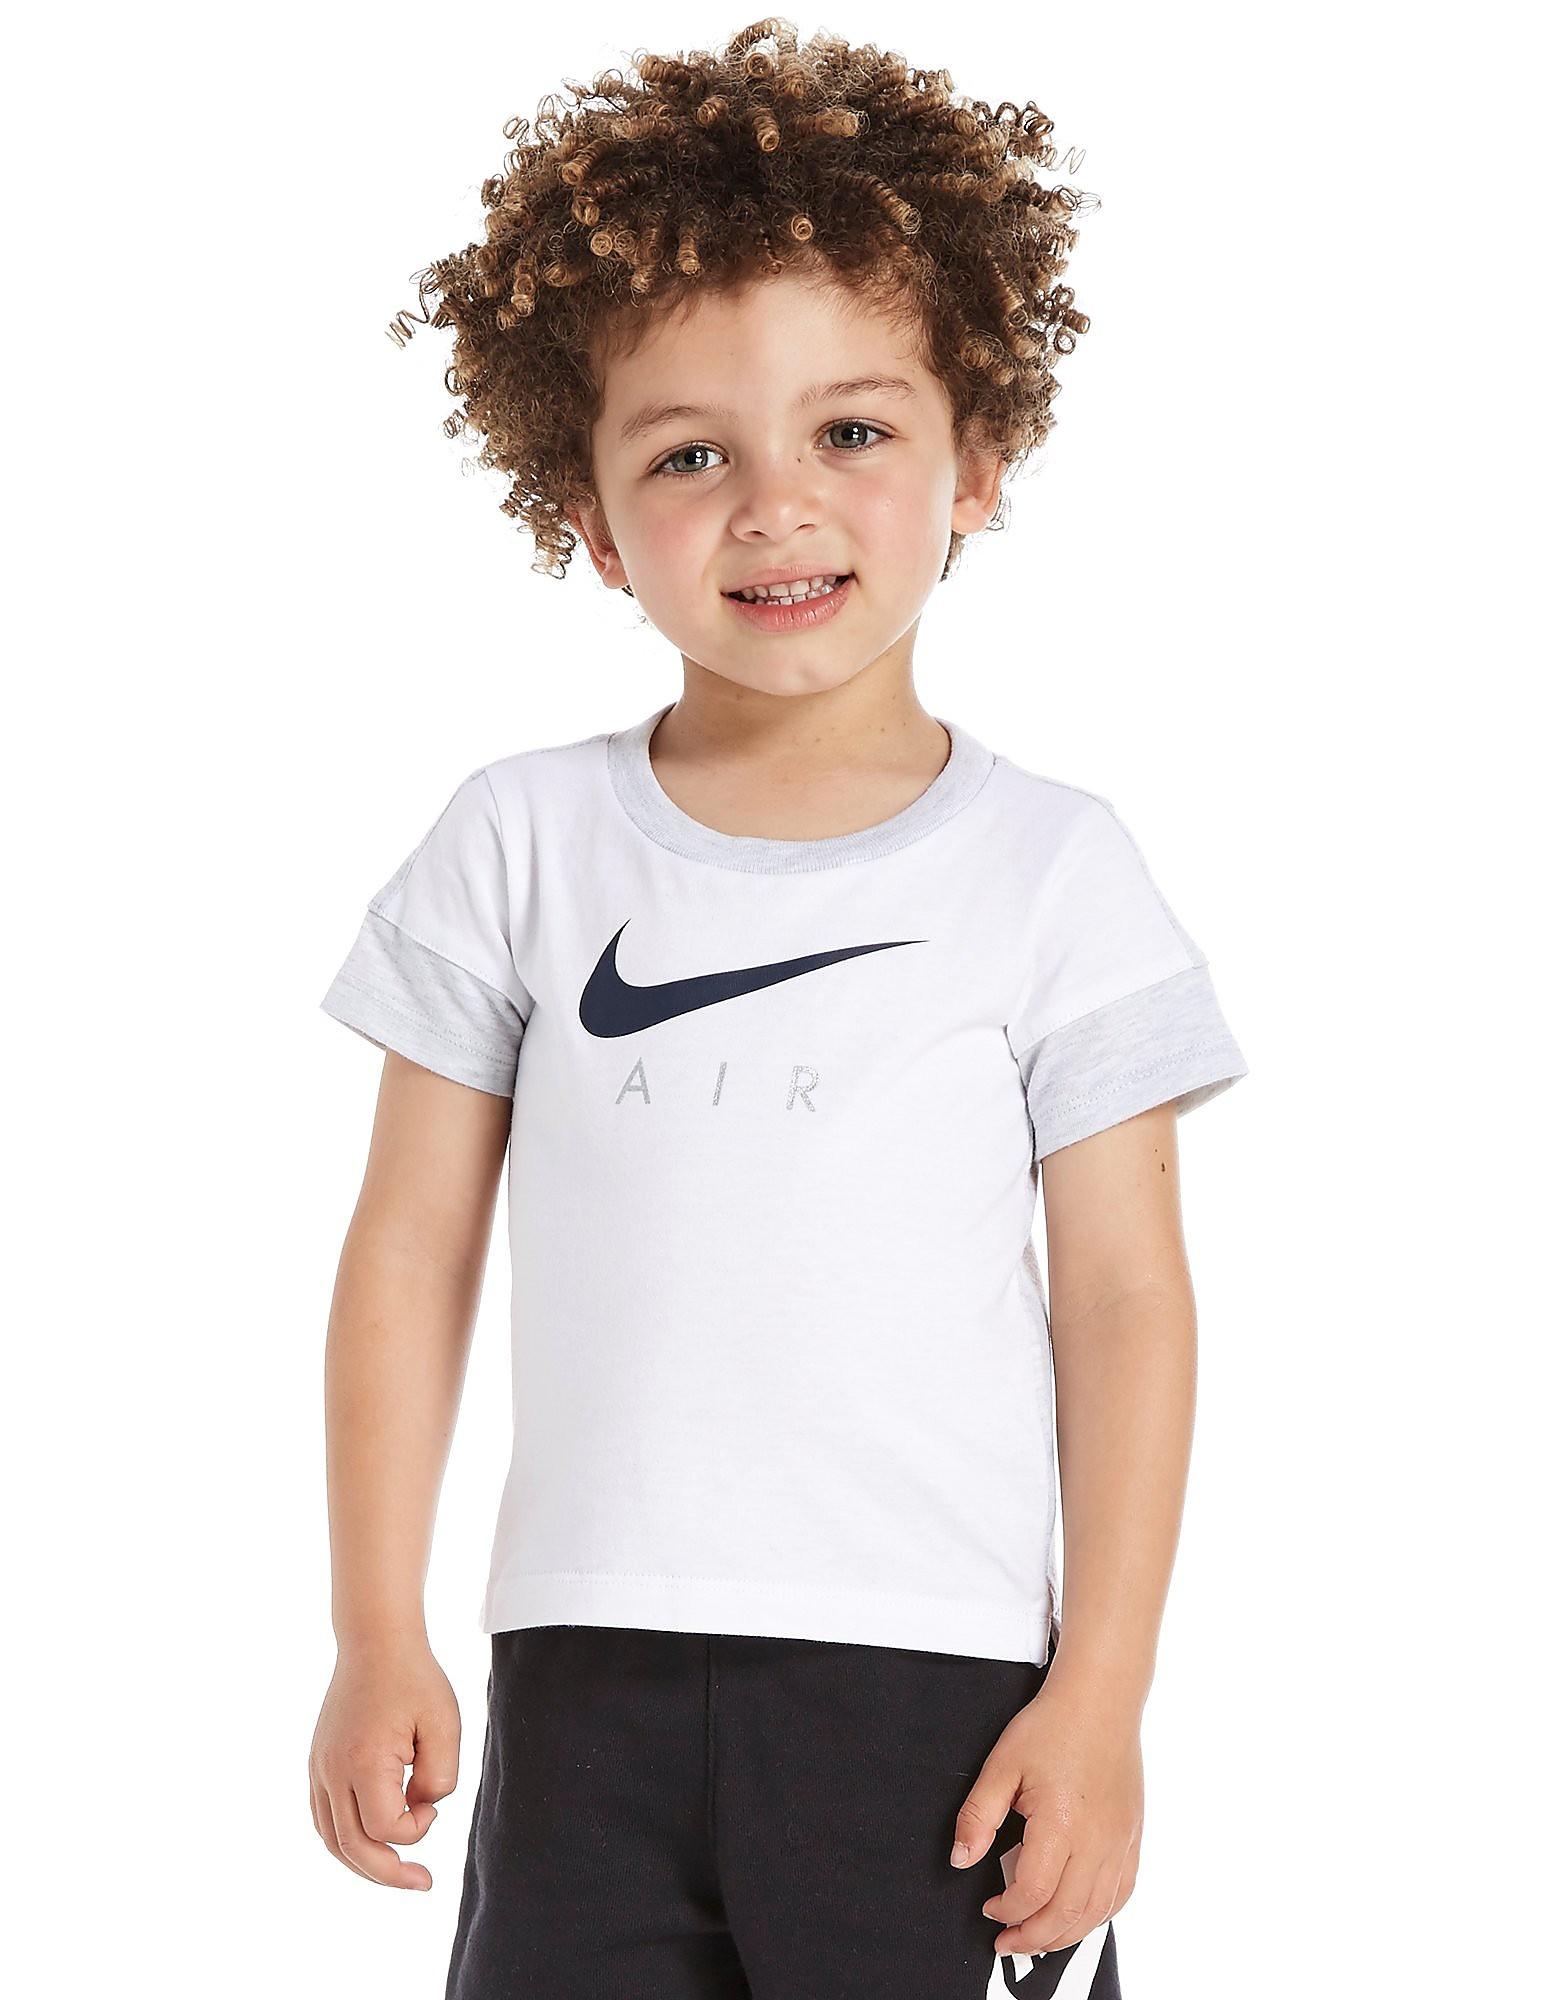 Nike Air T-Shirt Infant - alleen bij JD - Wit - Kind